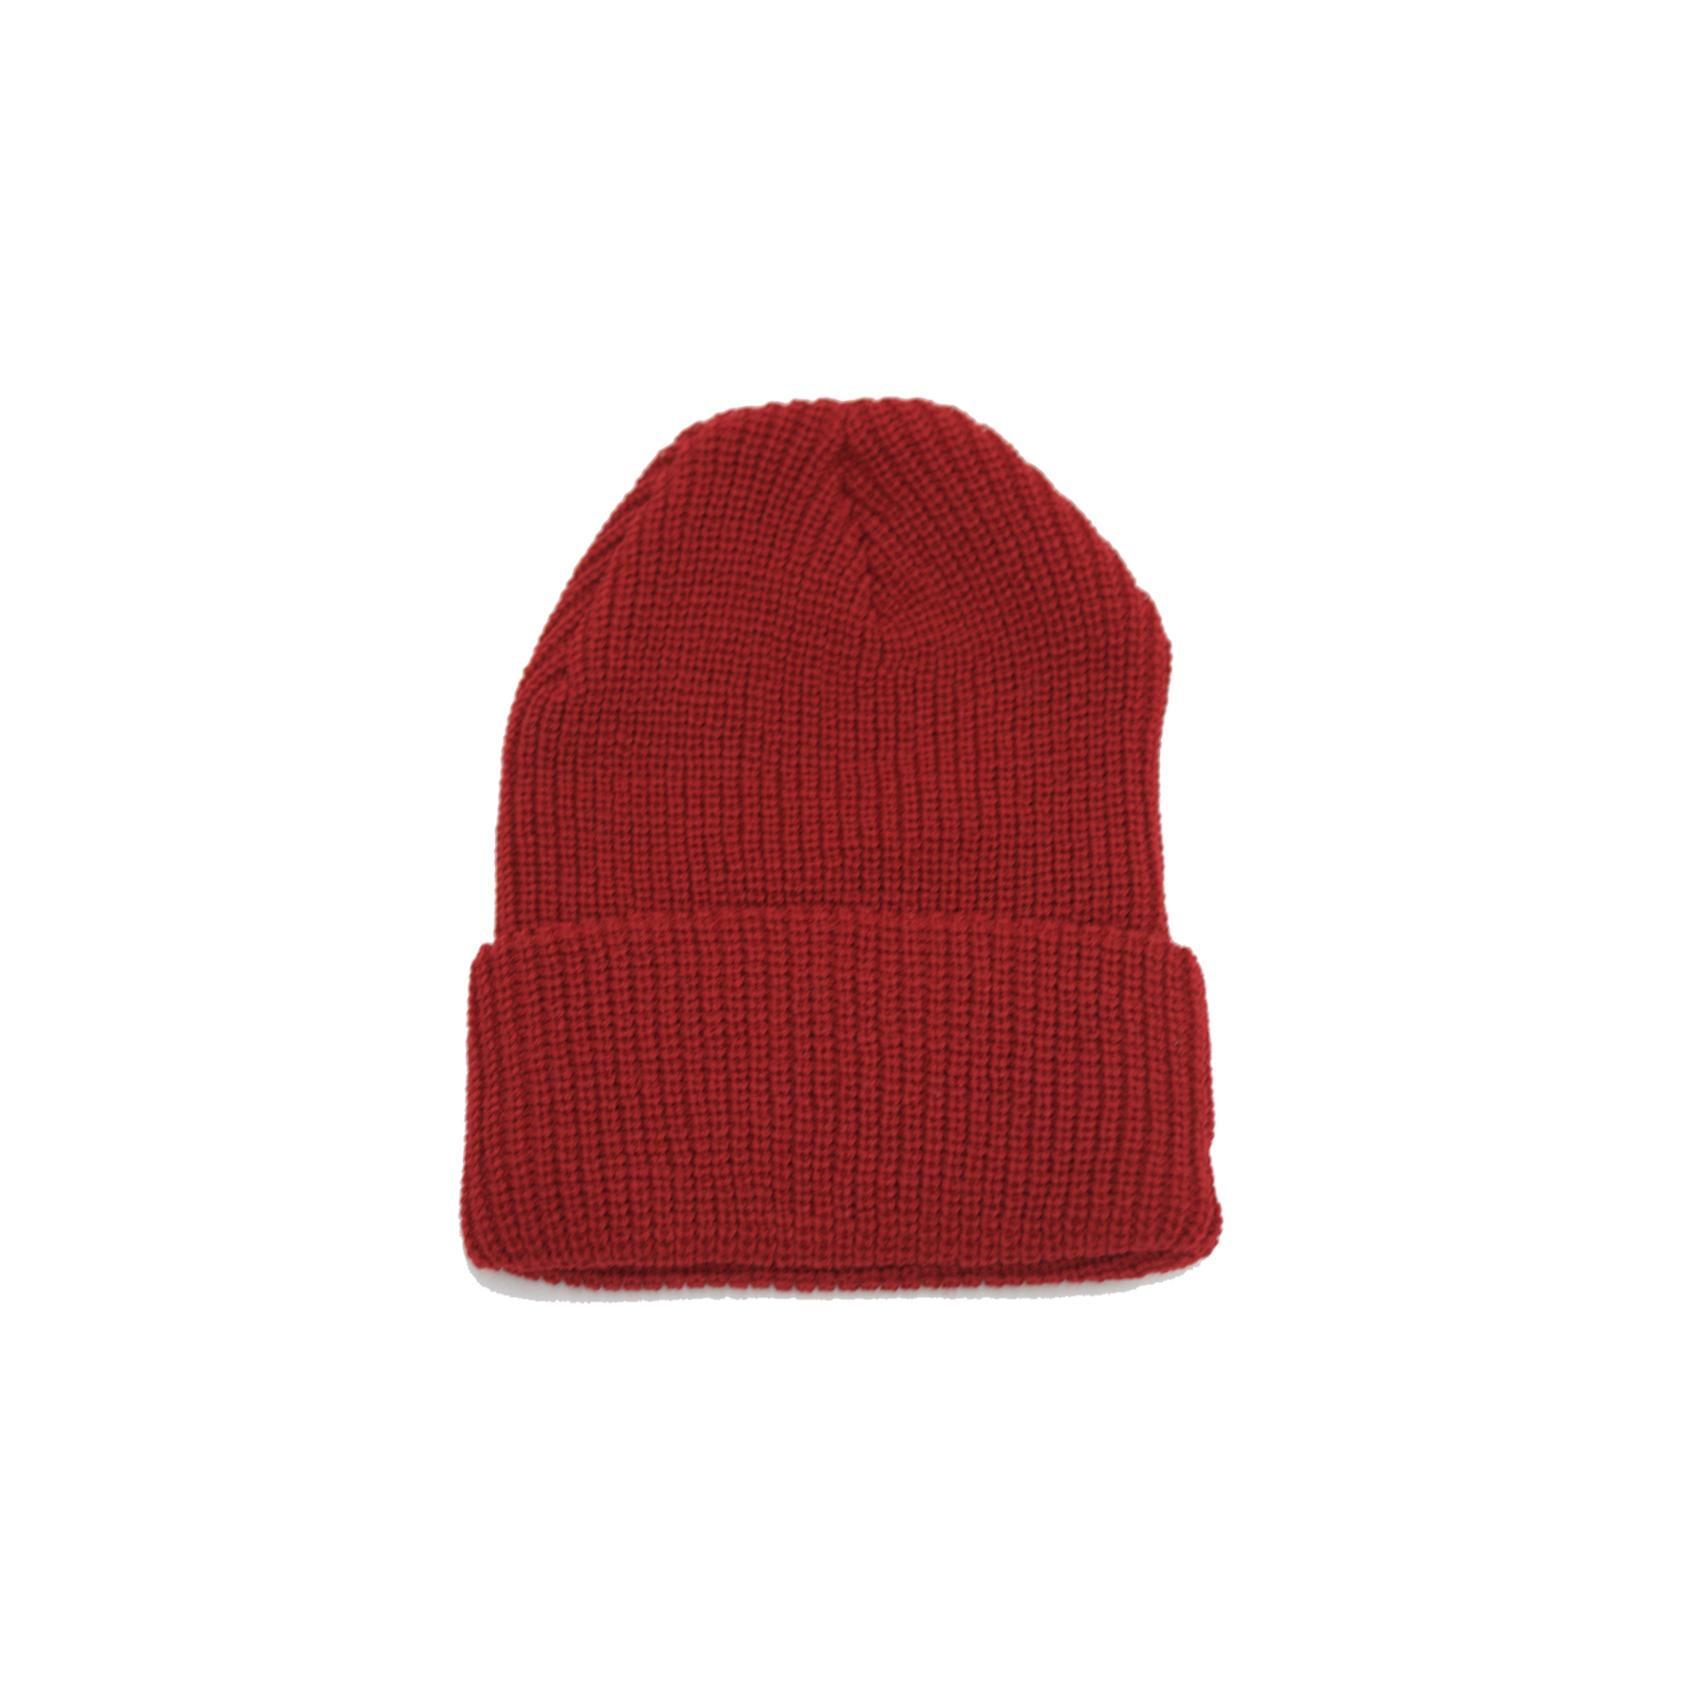 Rib Knit Beanie   Red   http://futurereplica.com